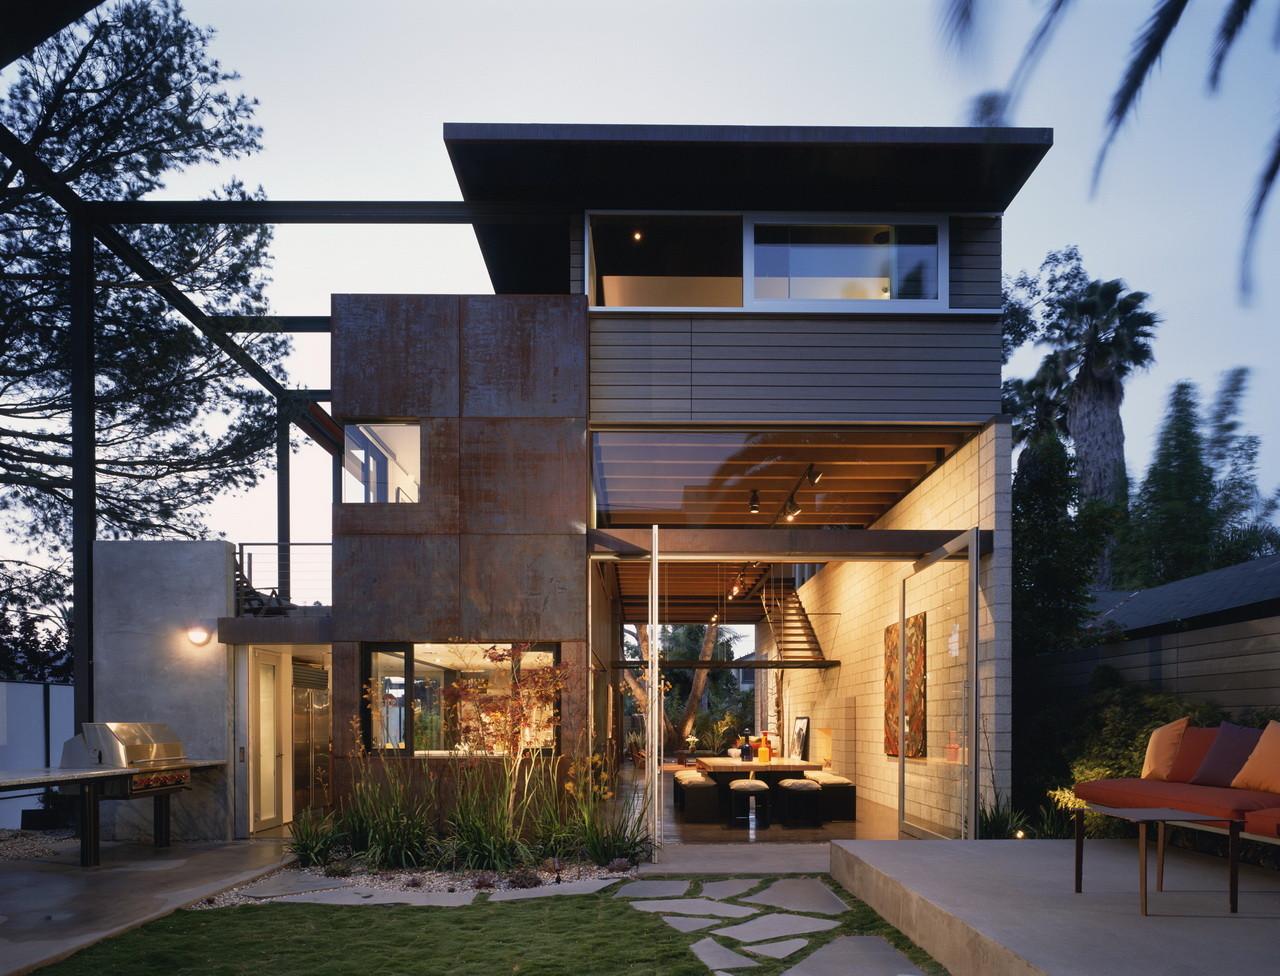 700 Palms Residence / Ehrlich Architects, Courtesy of Erhard Pfeiffer